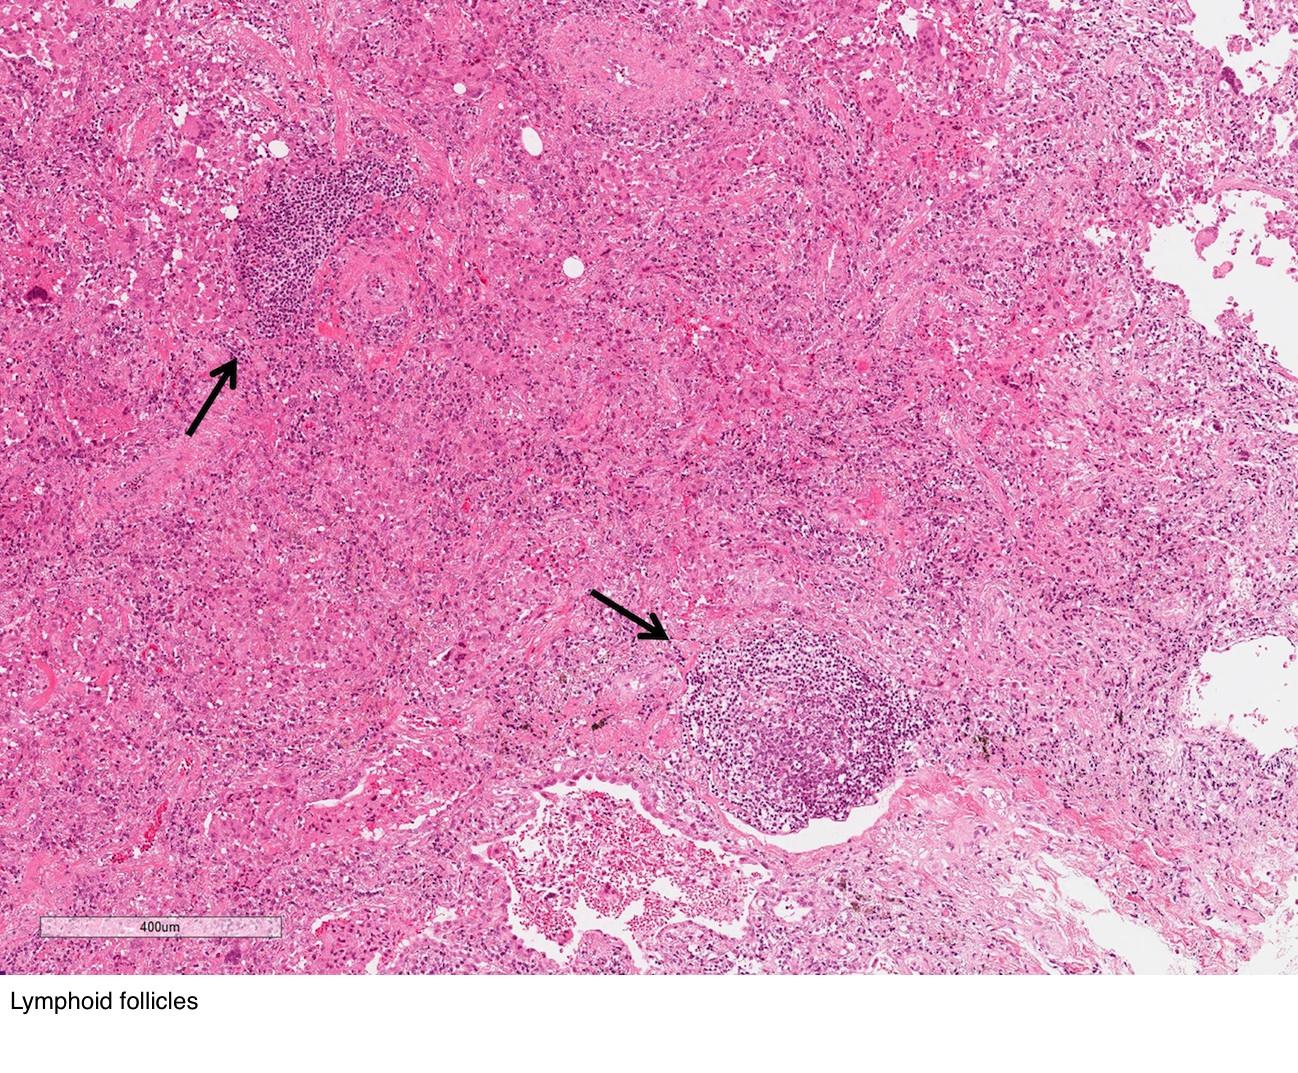 Lymphoid follicles